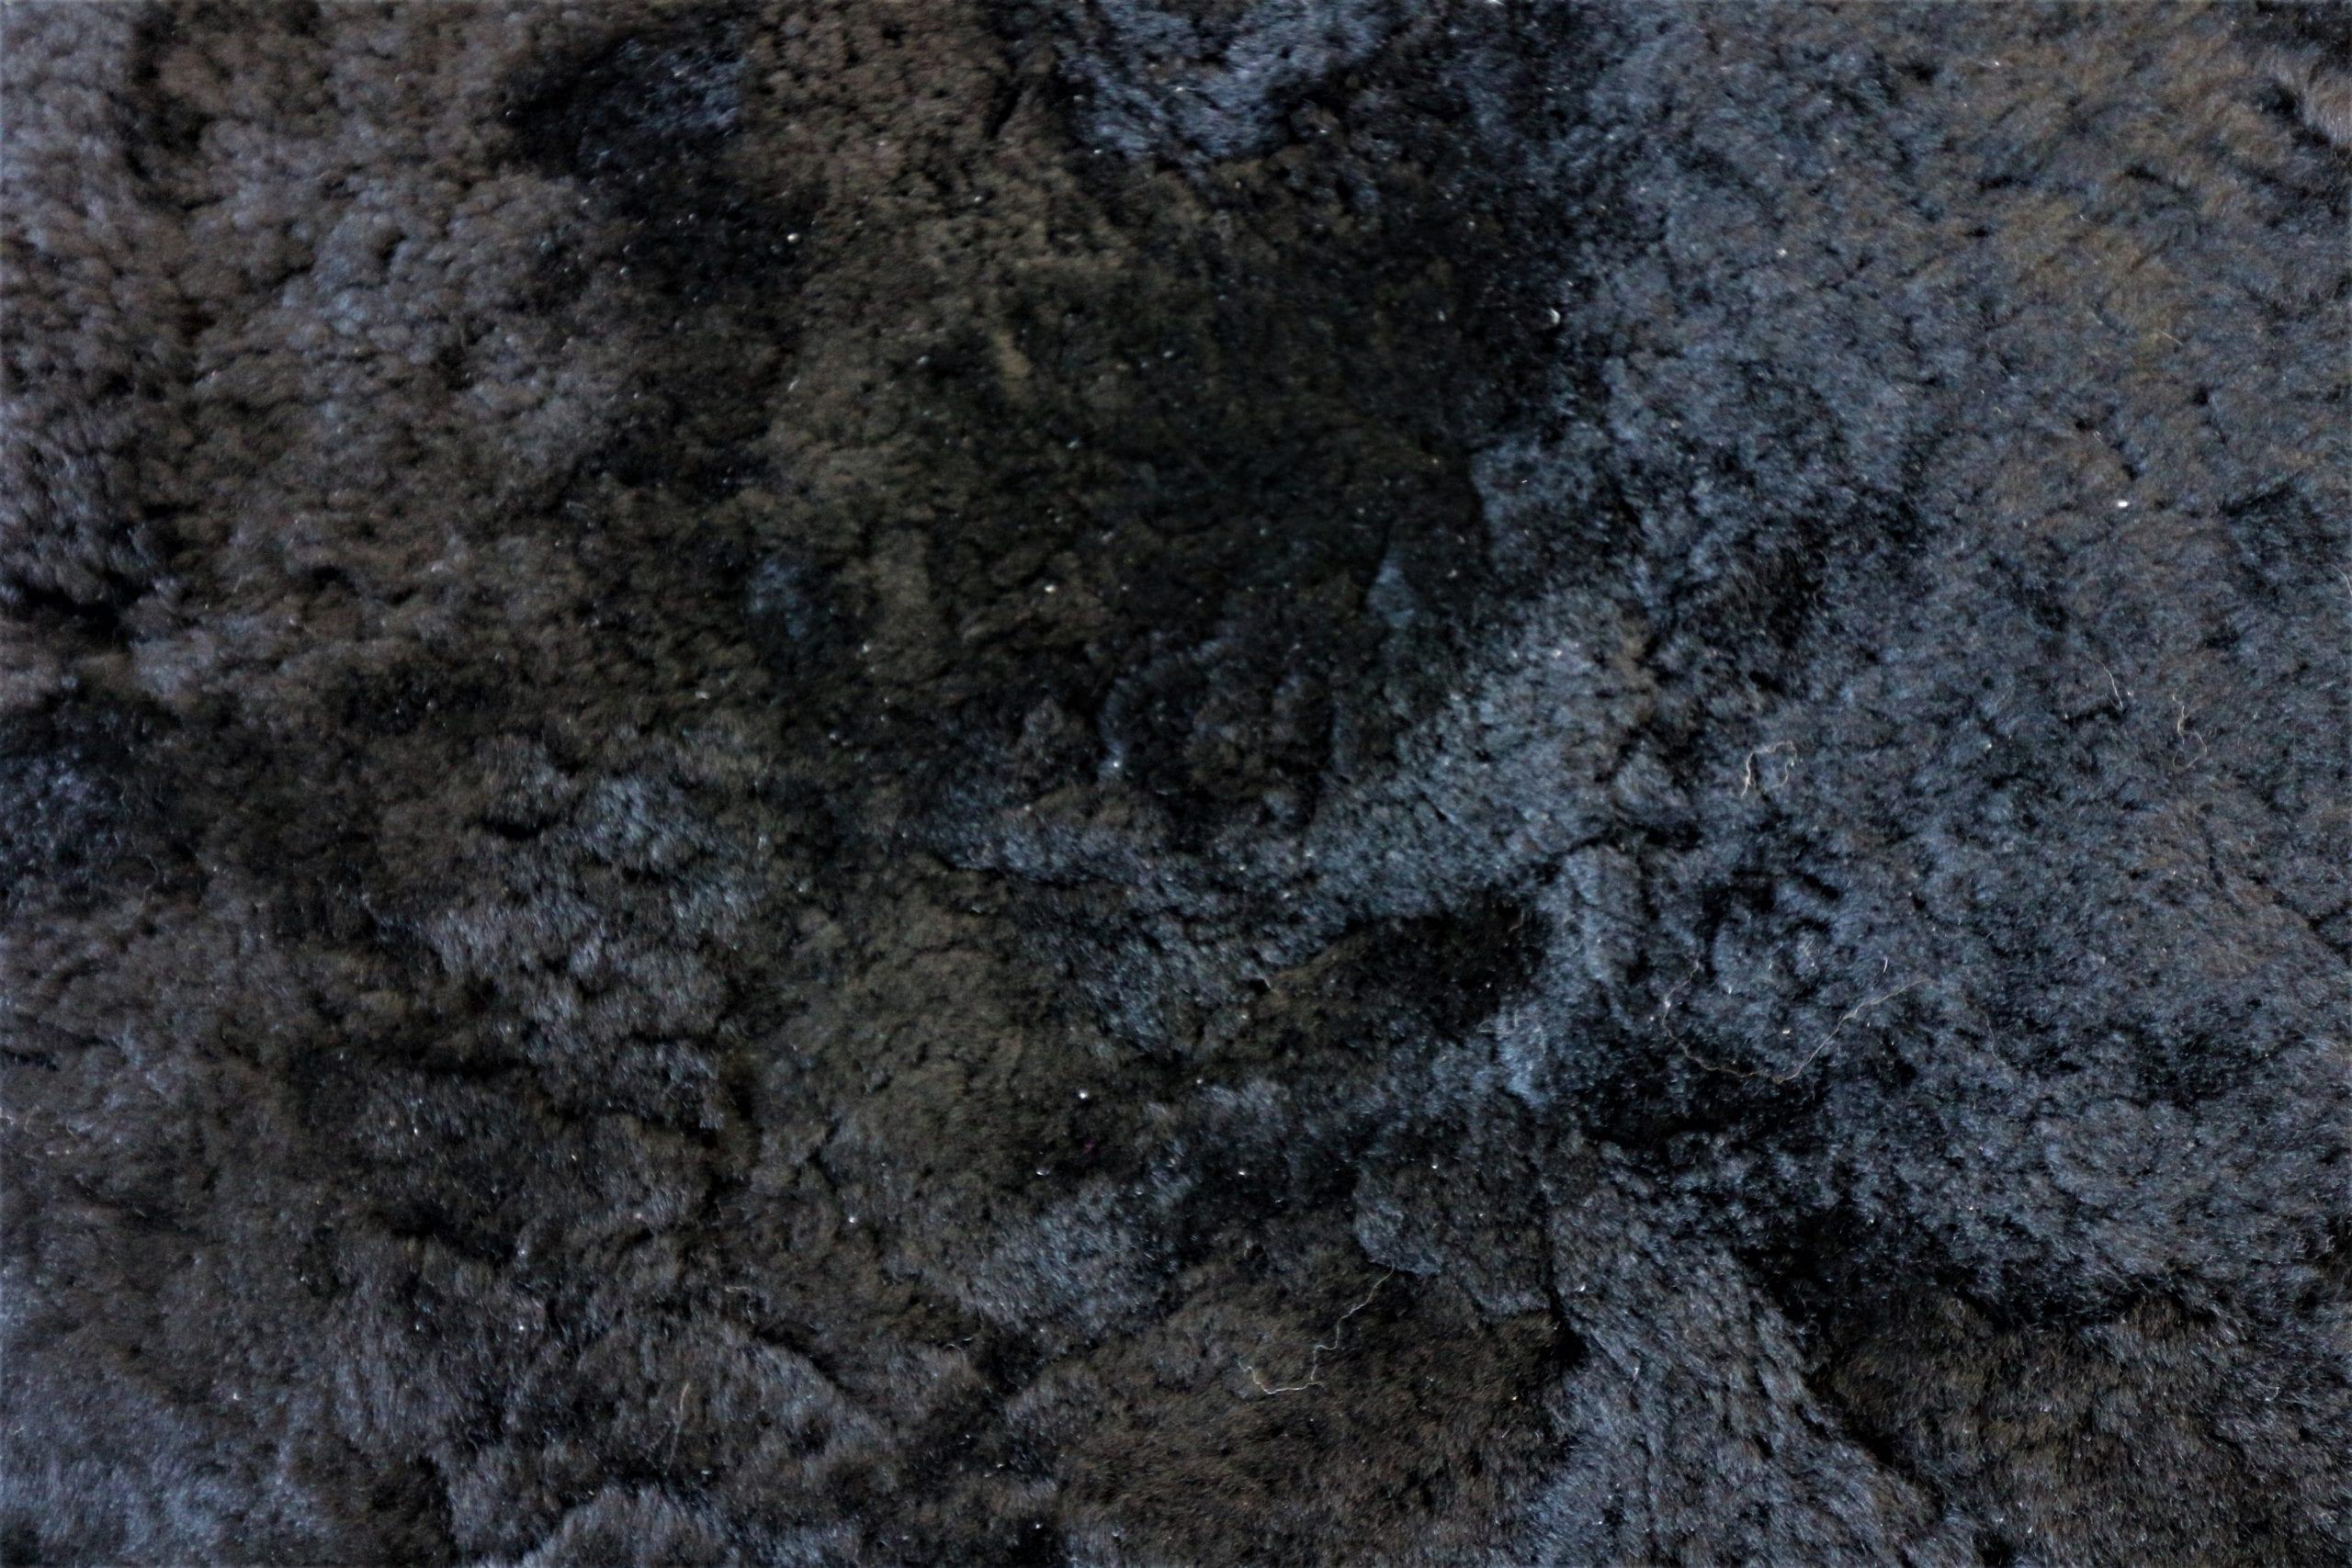 Black Shearling Sheepskin Rug